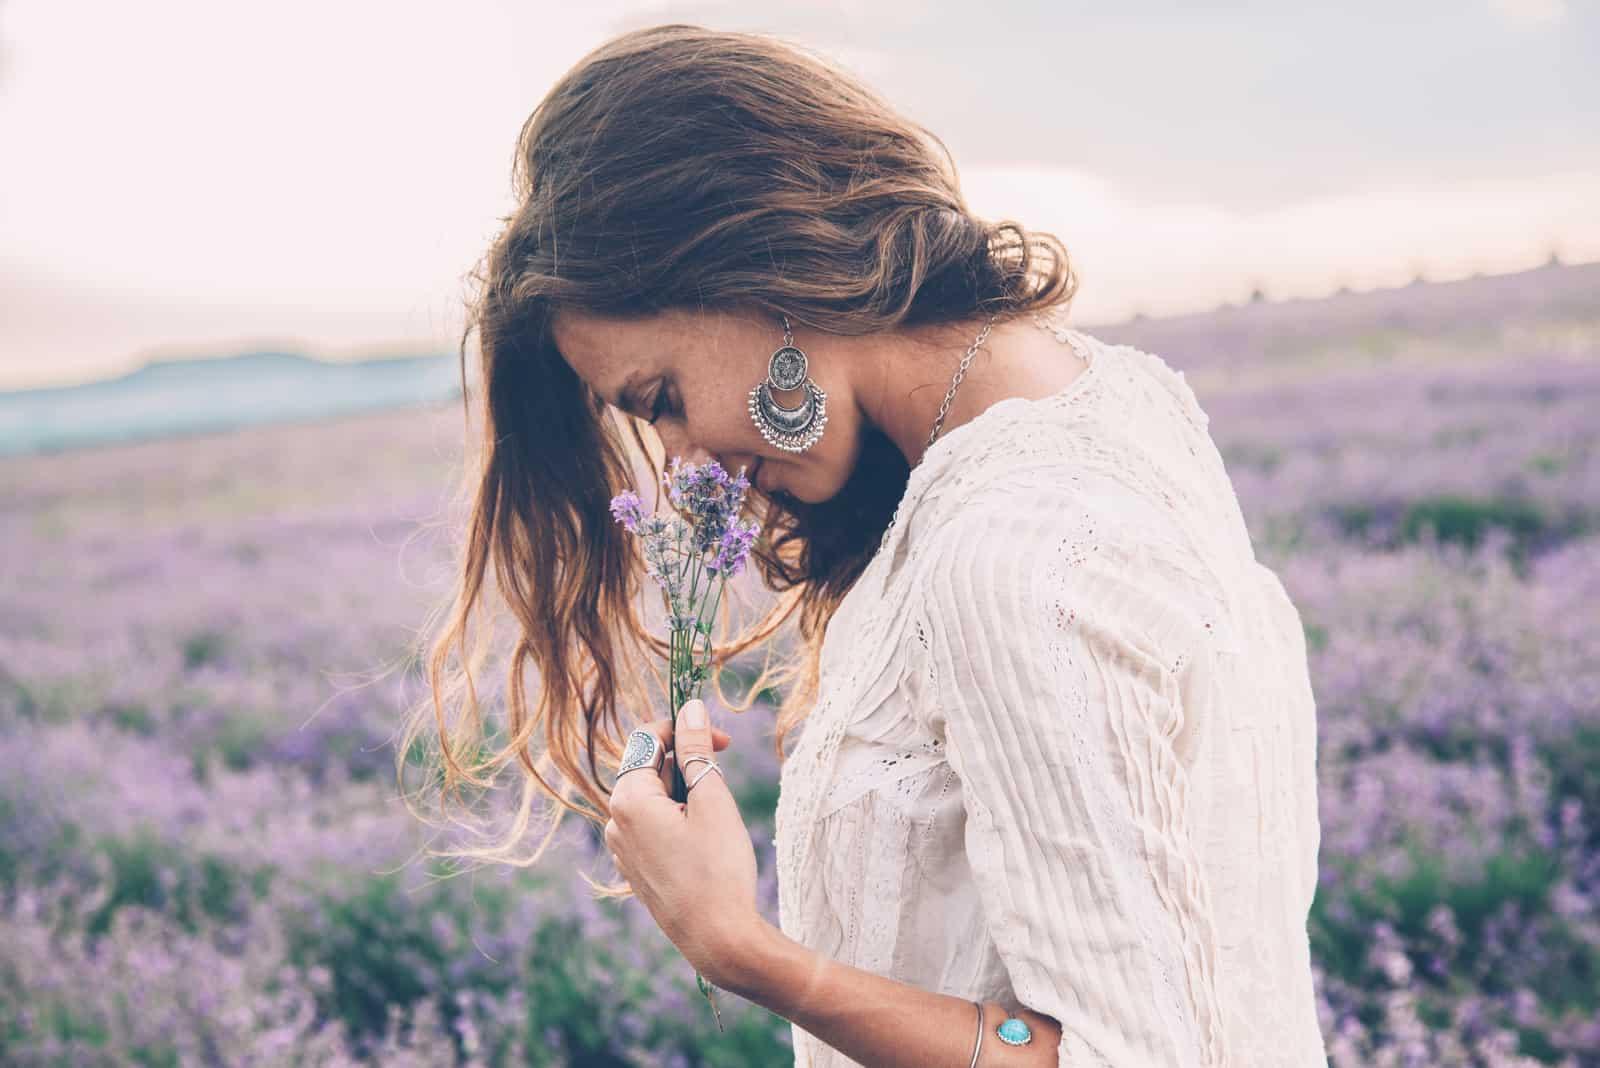 schöne Frau im Lavendelfeld